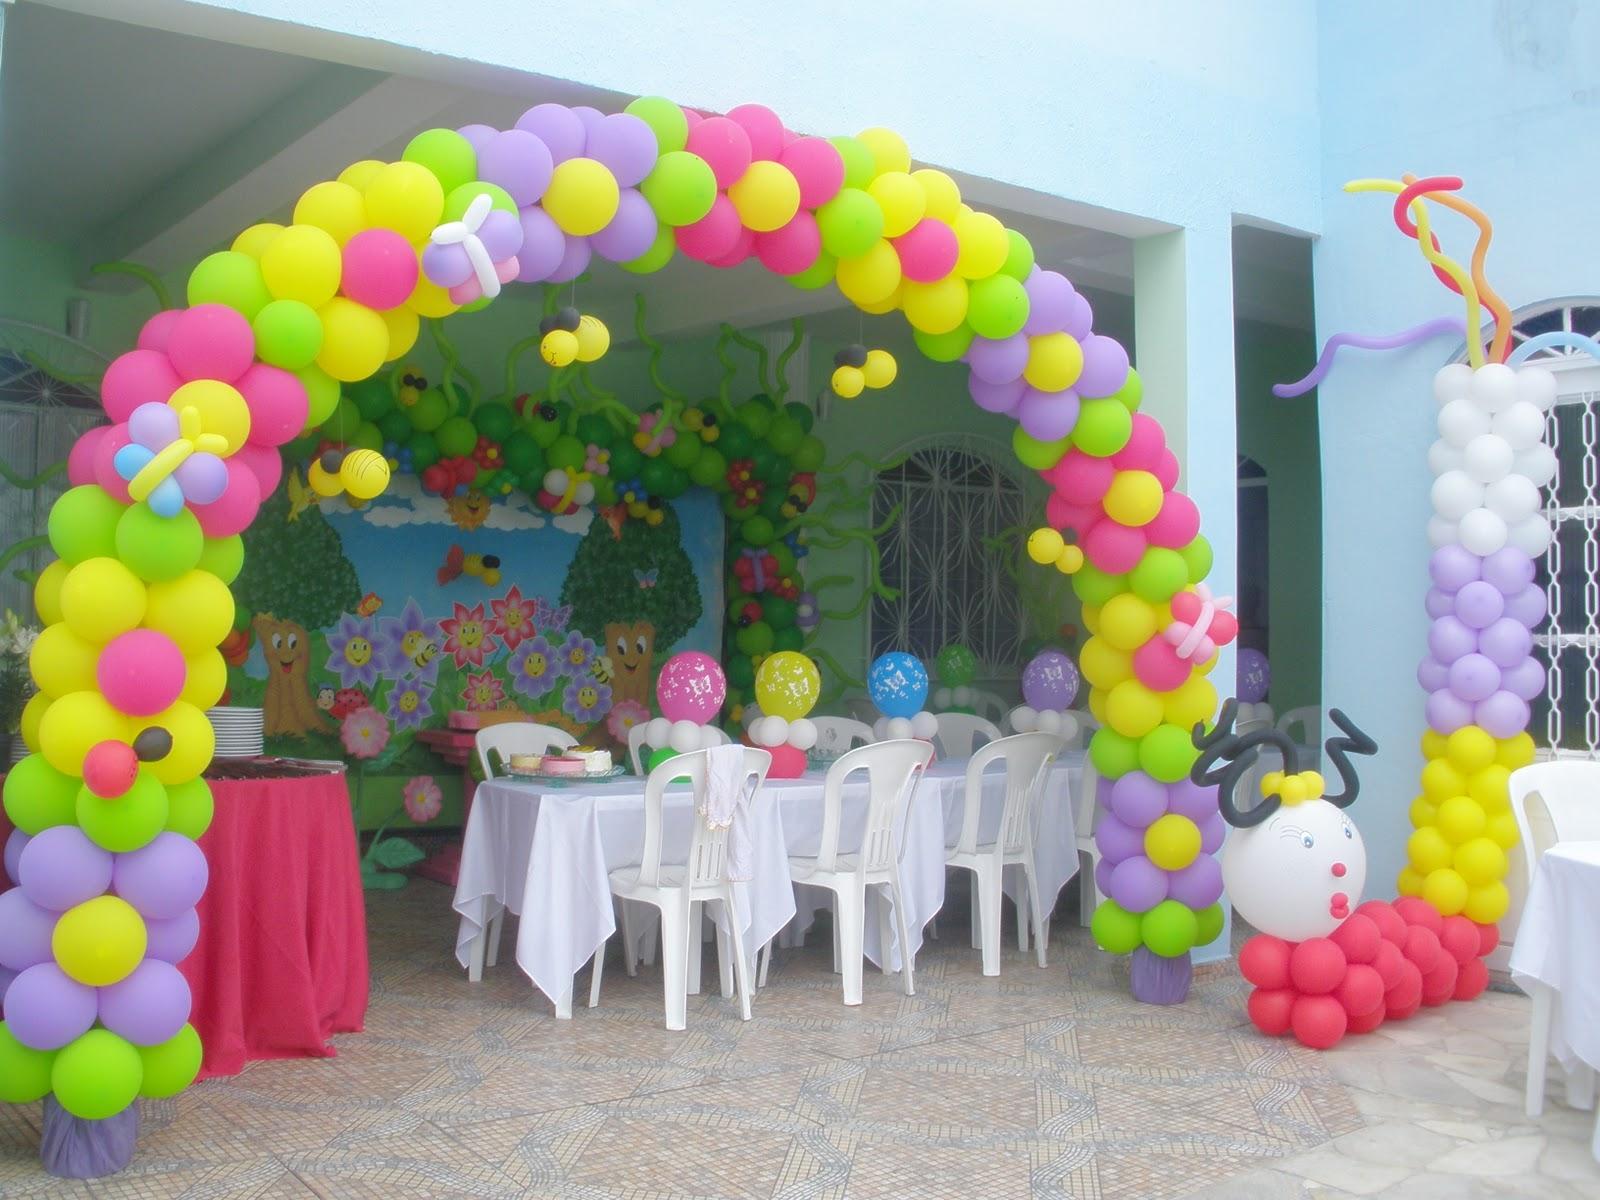 fotos festa jardim encantado:Colorindo Festas: Festa Jardim Encantado.